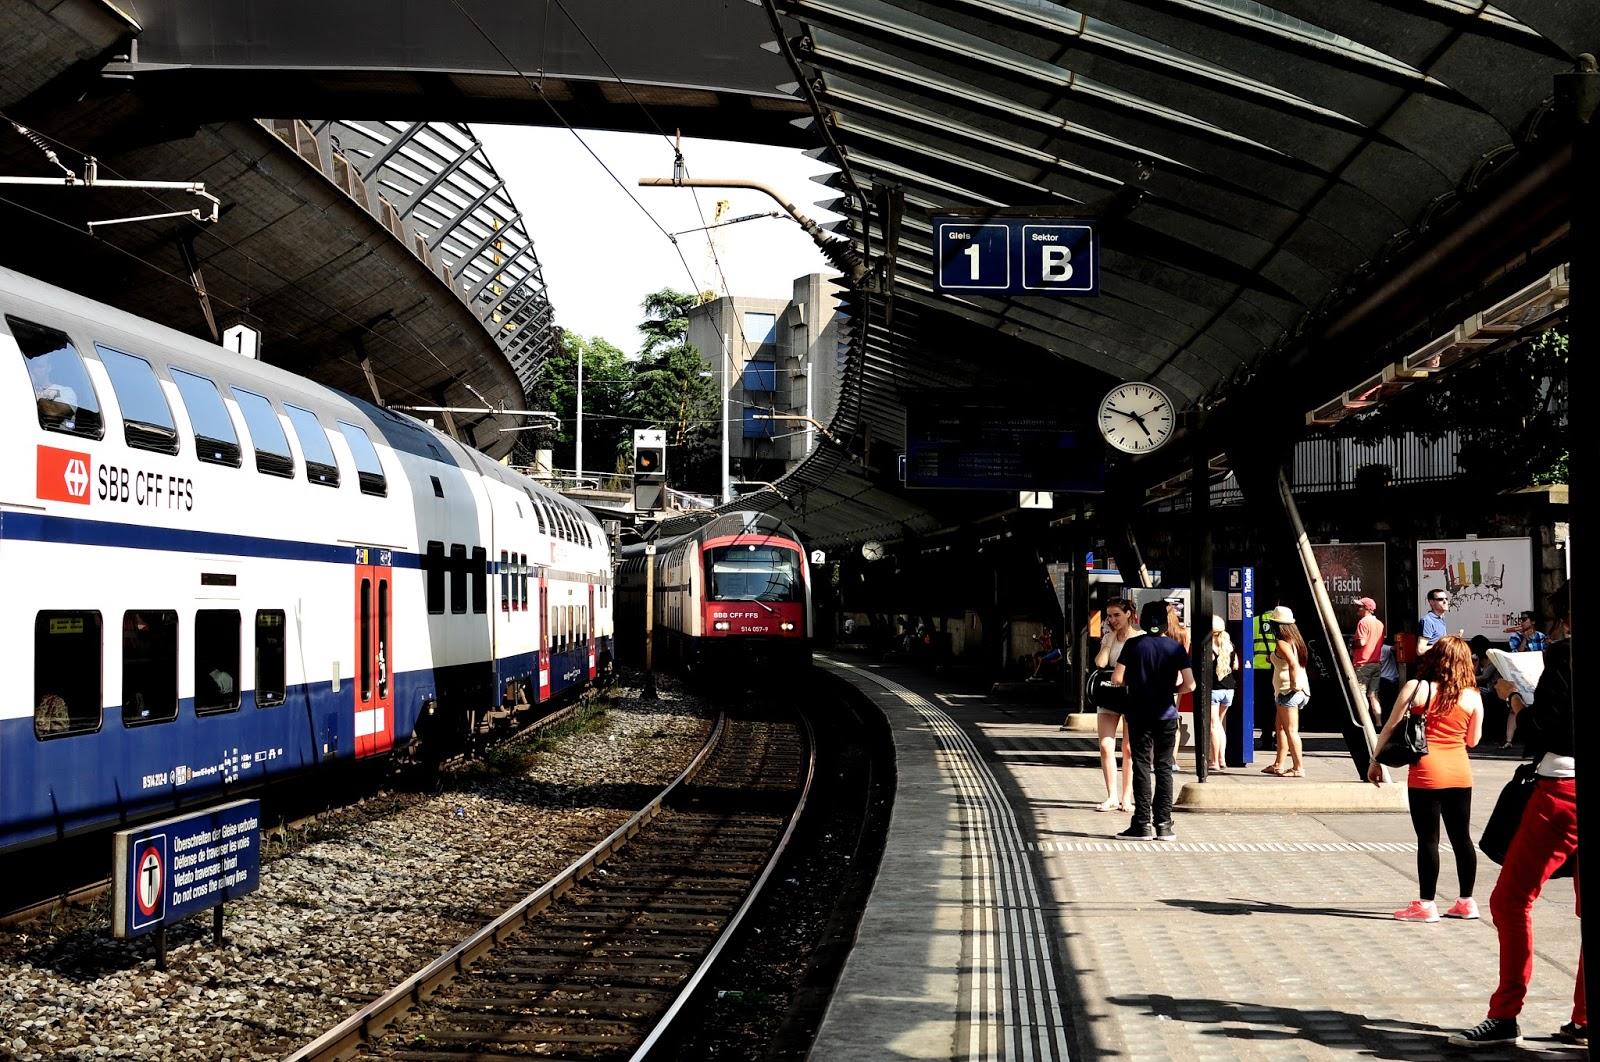 Calendar Zurich : Loving switzerland stadelhofen station calatrava